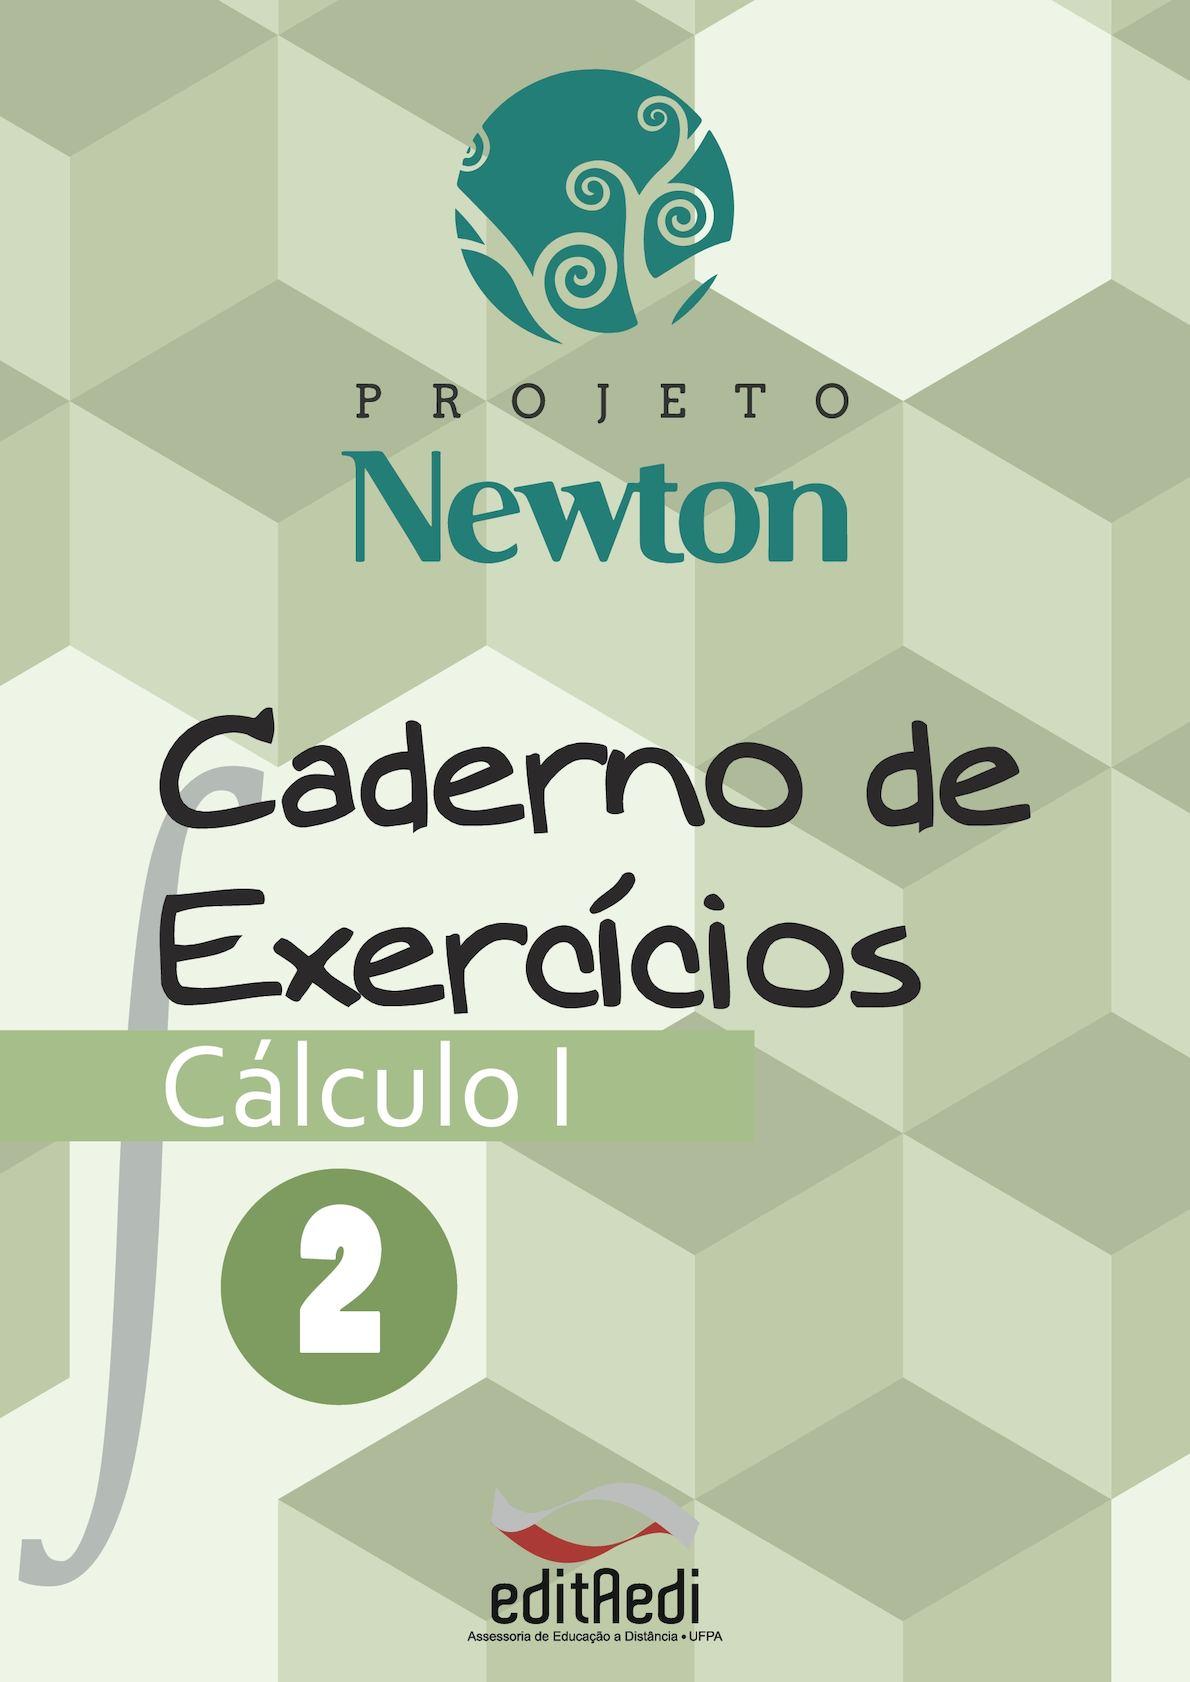 Caderno de Exercícios Cálculo I - 2017